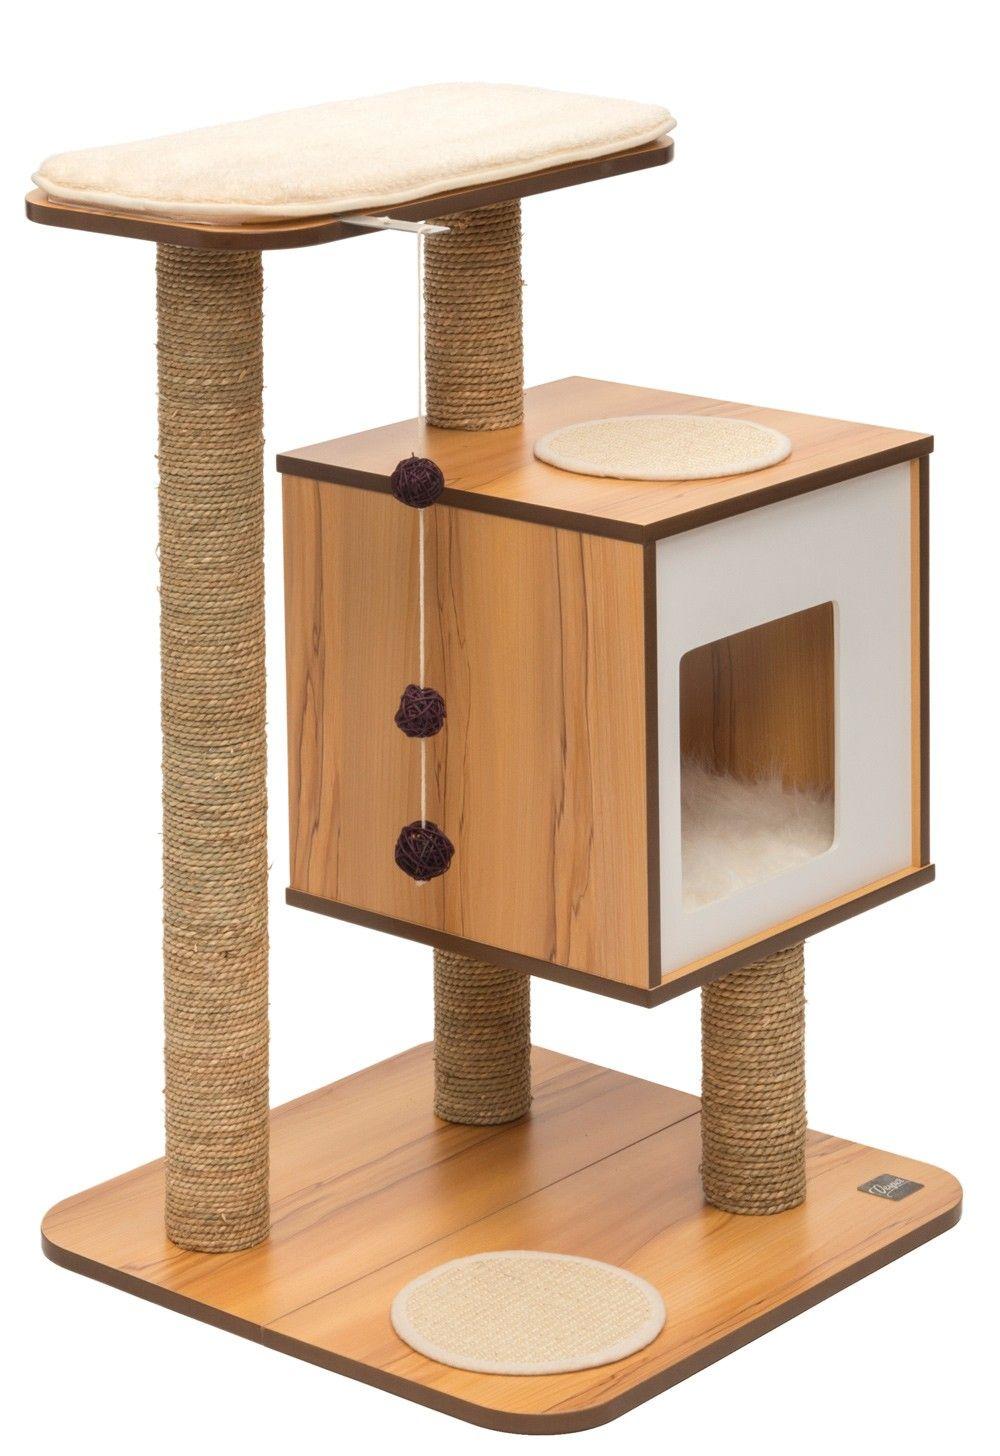 arbre chat vesper base cats mobilier pour chat. Black Bedroom Furniture Sets. Home Design Ideas